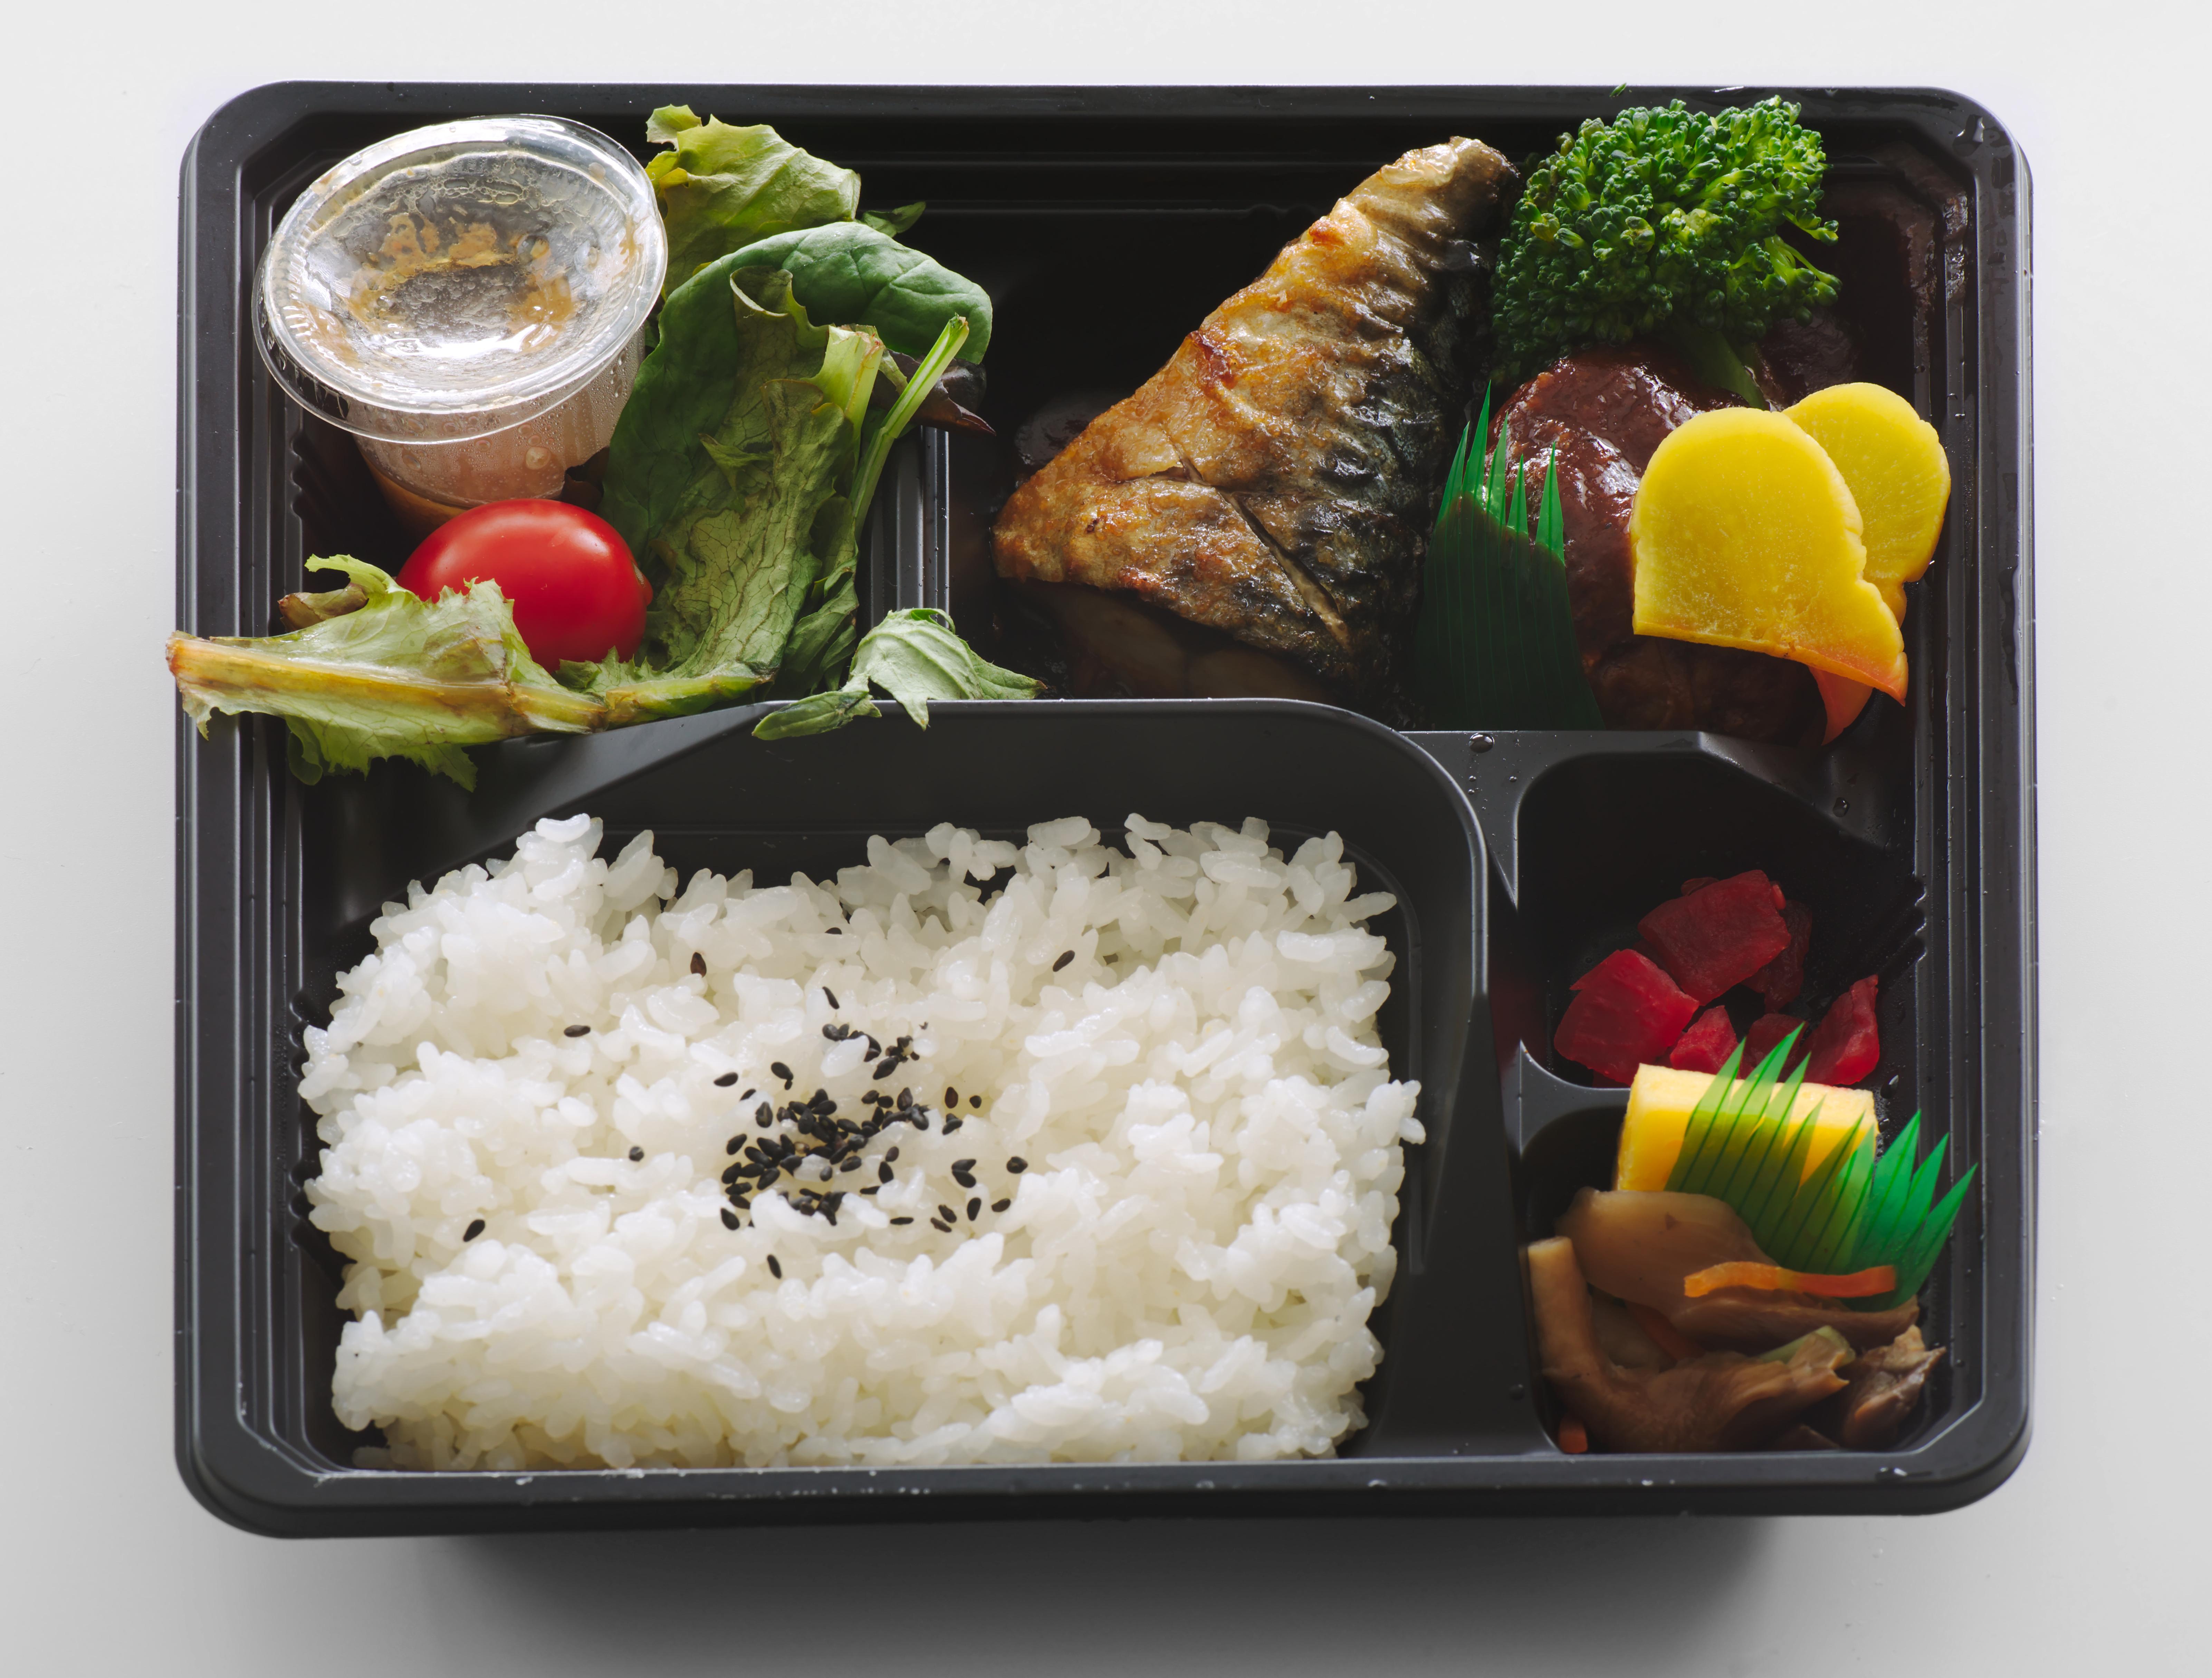 adabox_Bento_box_from_a_grocery_store.jpg